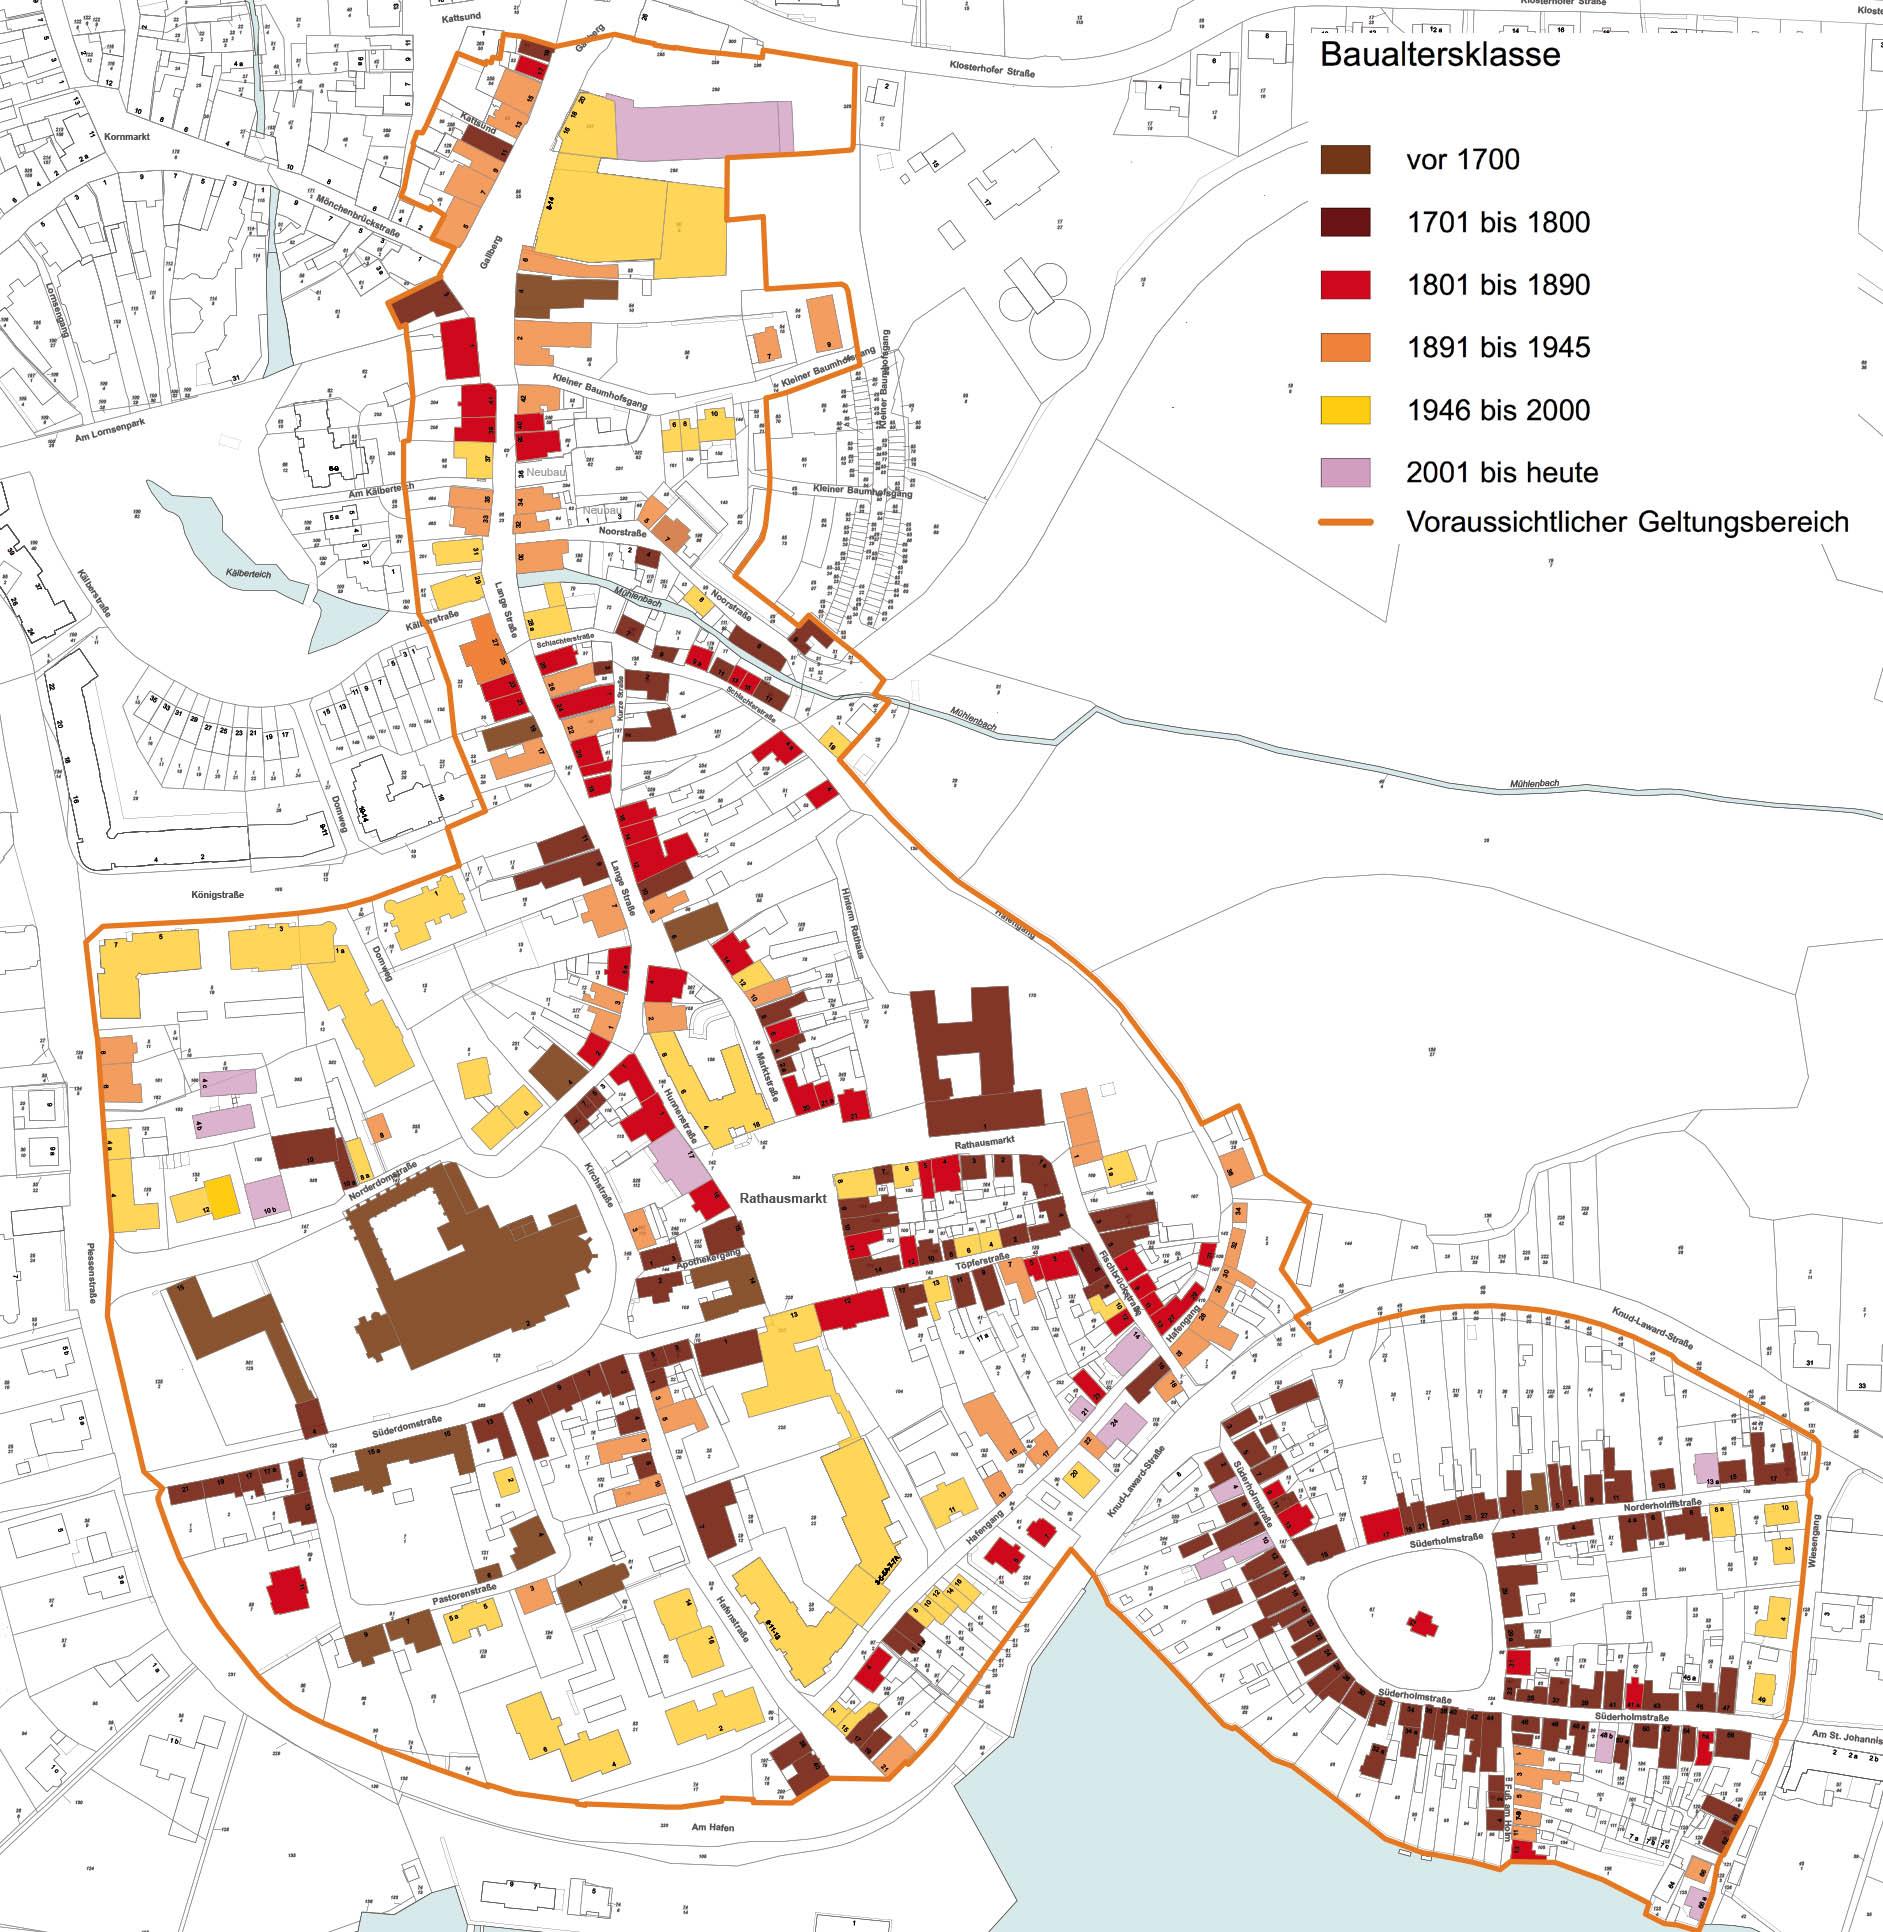 Gestaltungssatzung Altstadt Holm Schleswig - Baualtersklasse